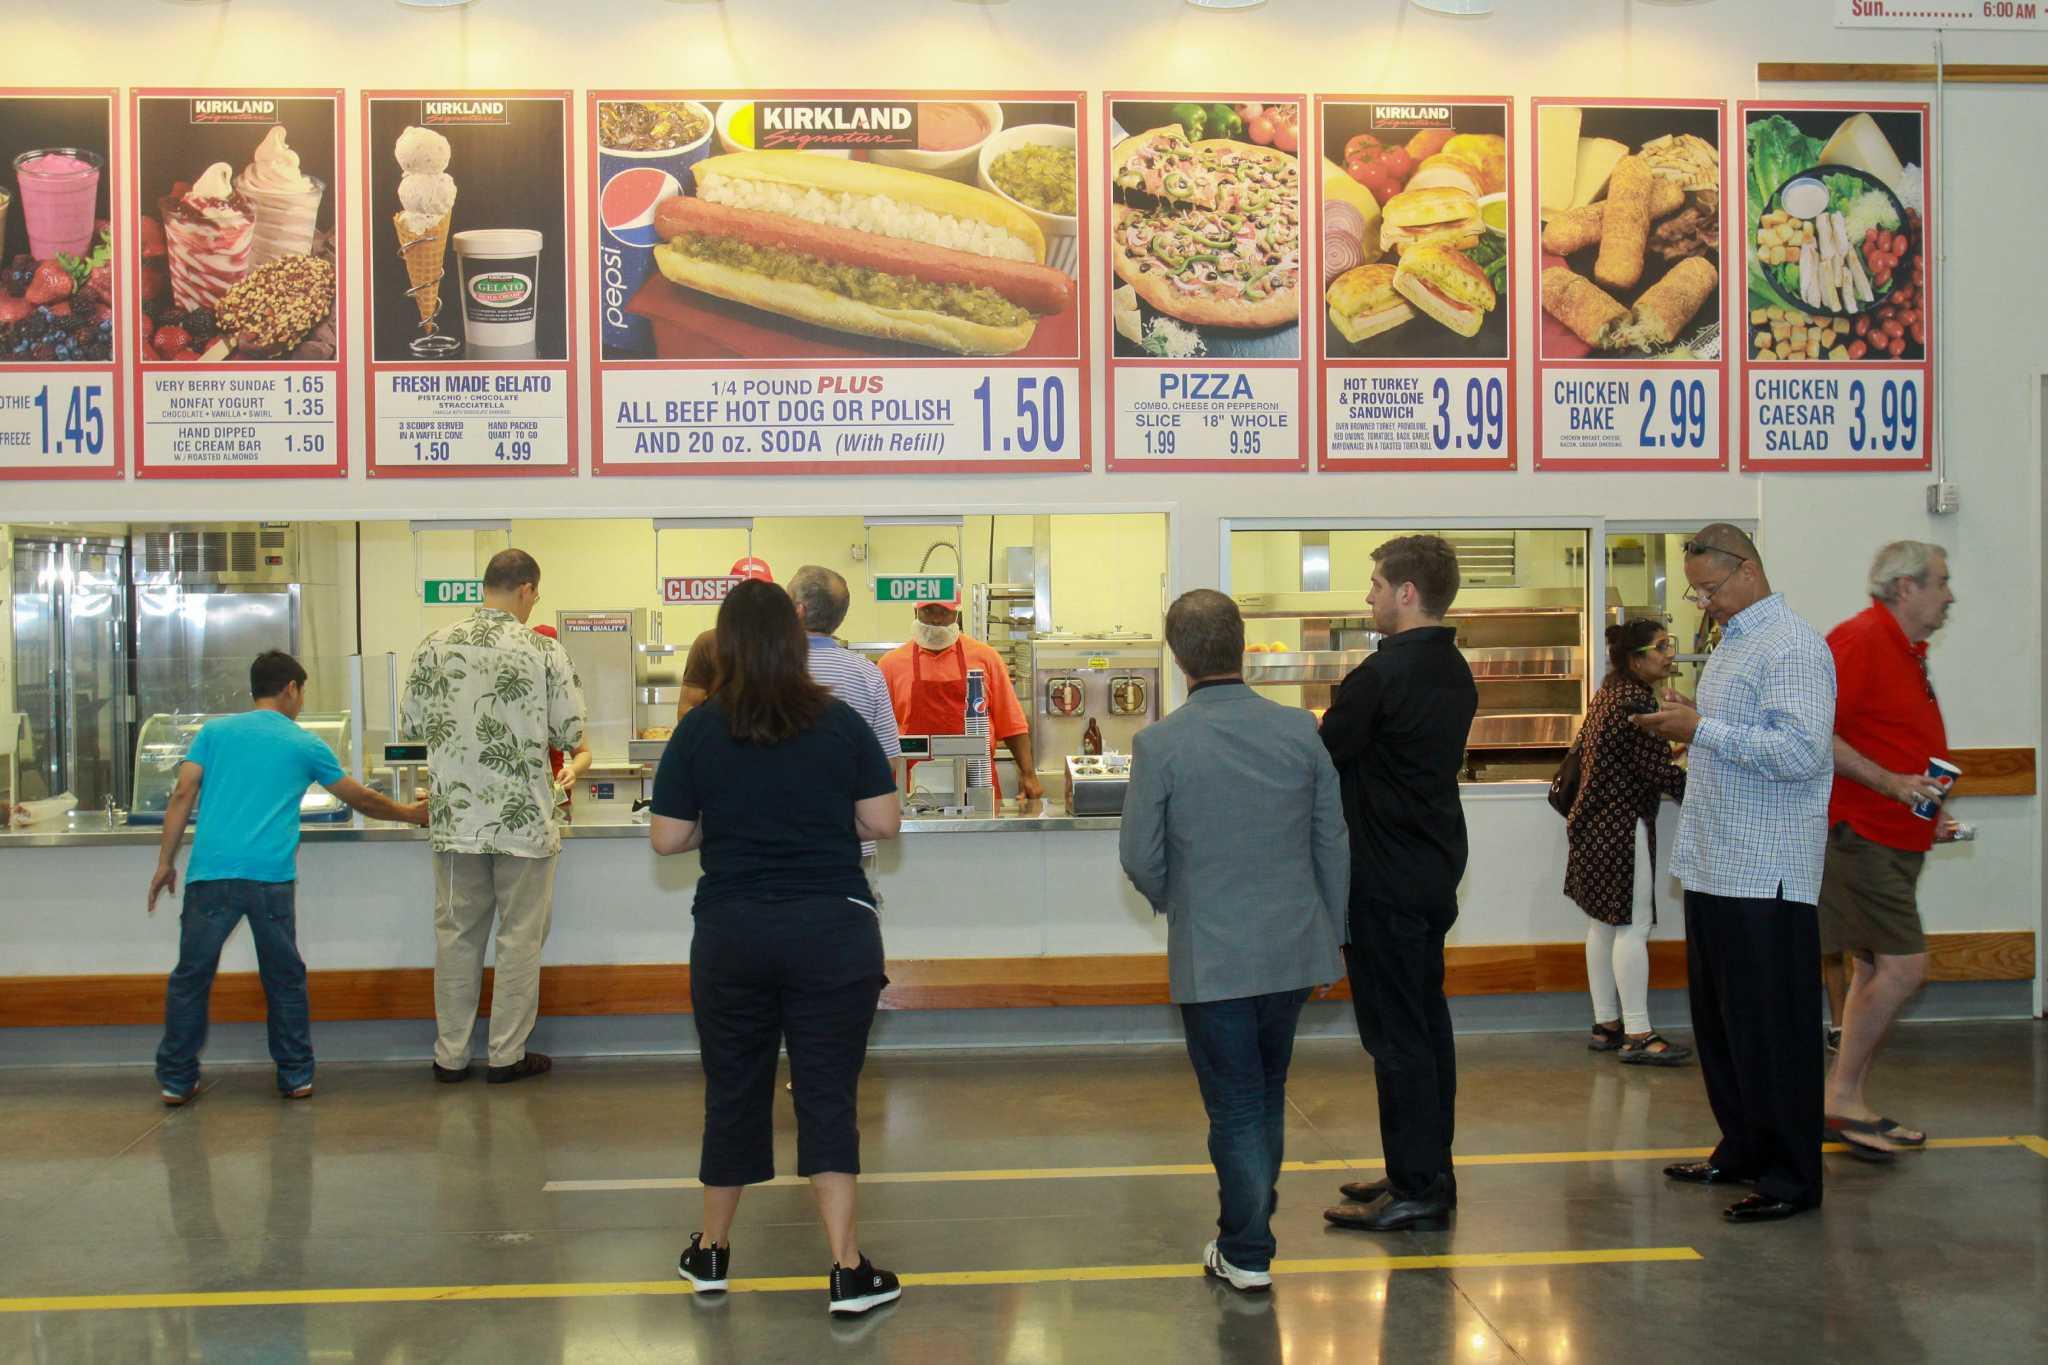 Sam S Club Fountain Drinks Food Court